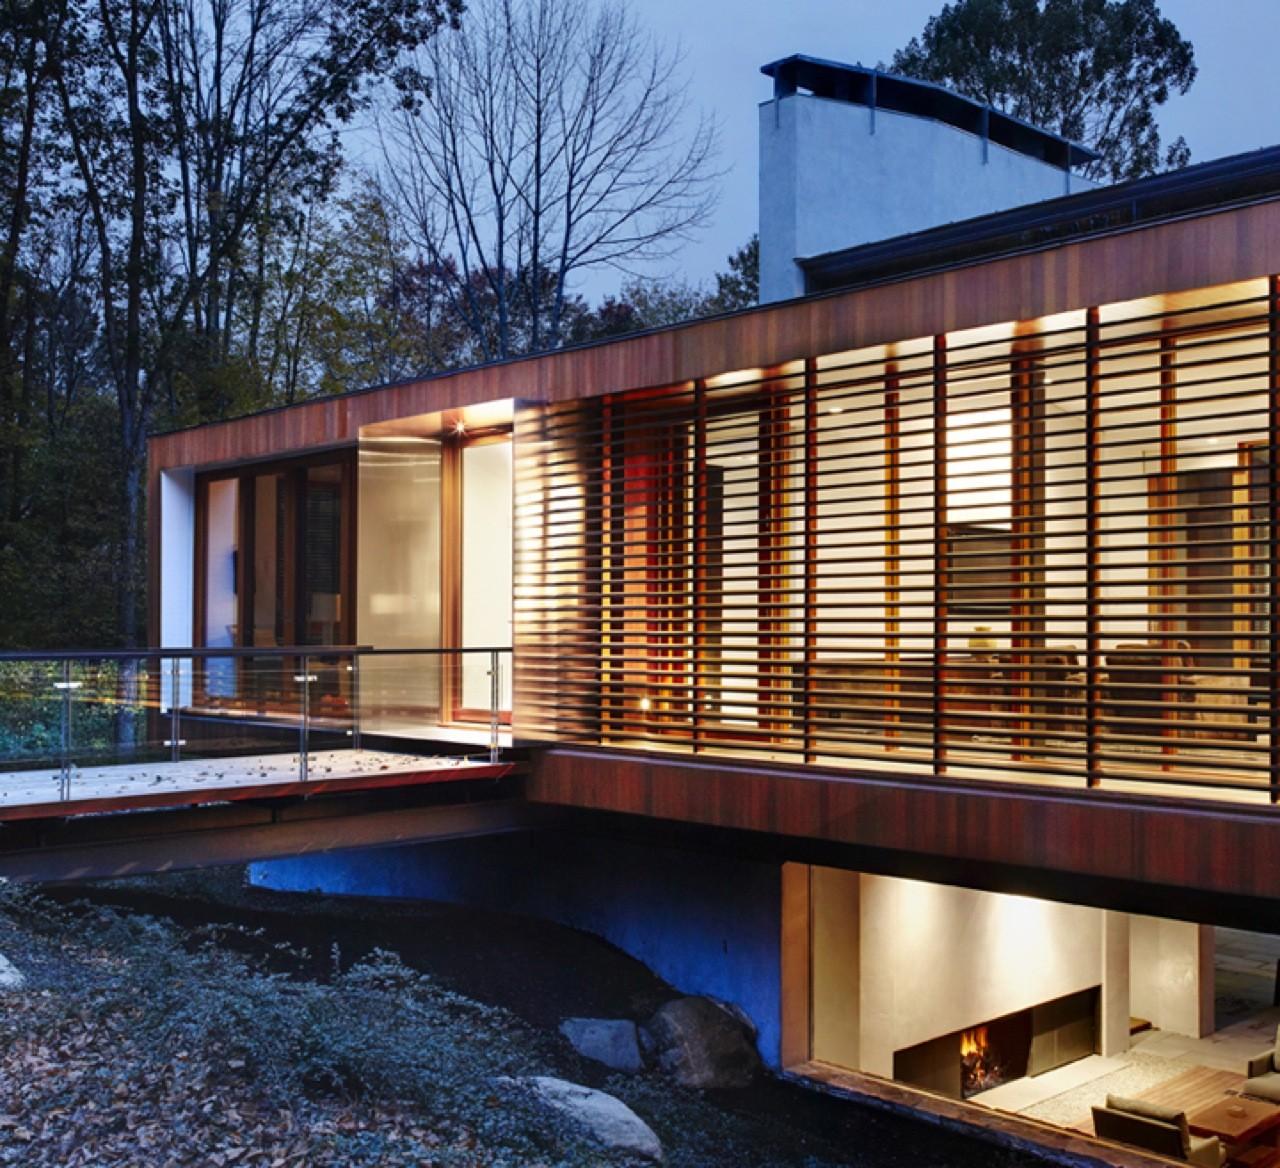 Bridge House By Junsekino Architect And Design: Gallery Of Bridge House / Joeb Moore + Partners Architects